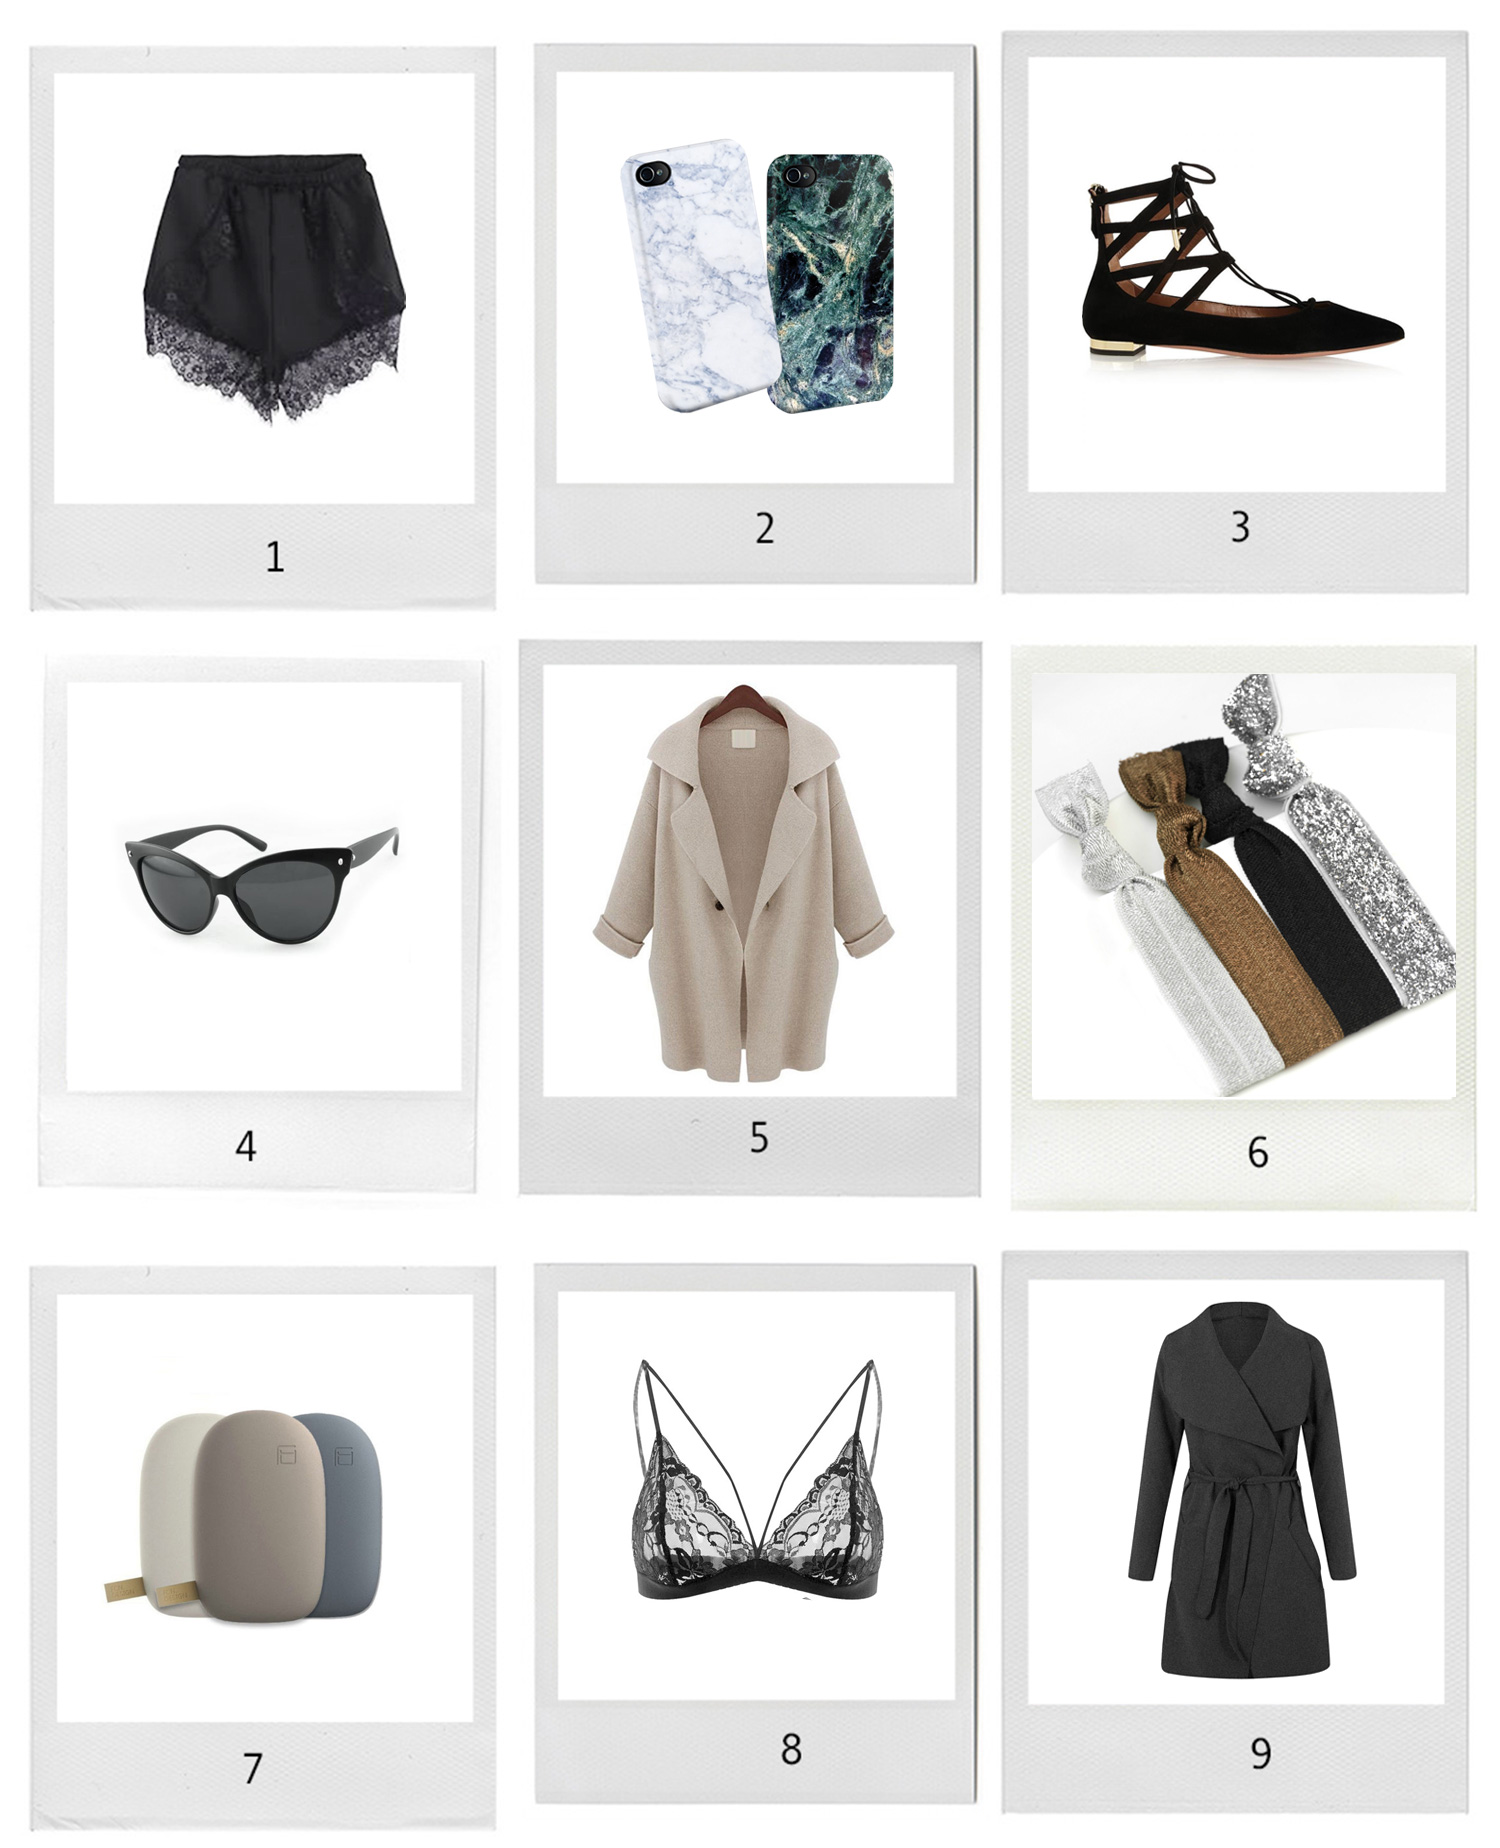 ebay,-modeblog,-blonde-bh,-power-bank@2x